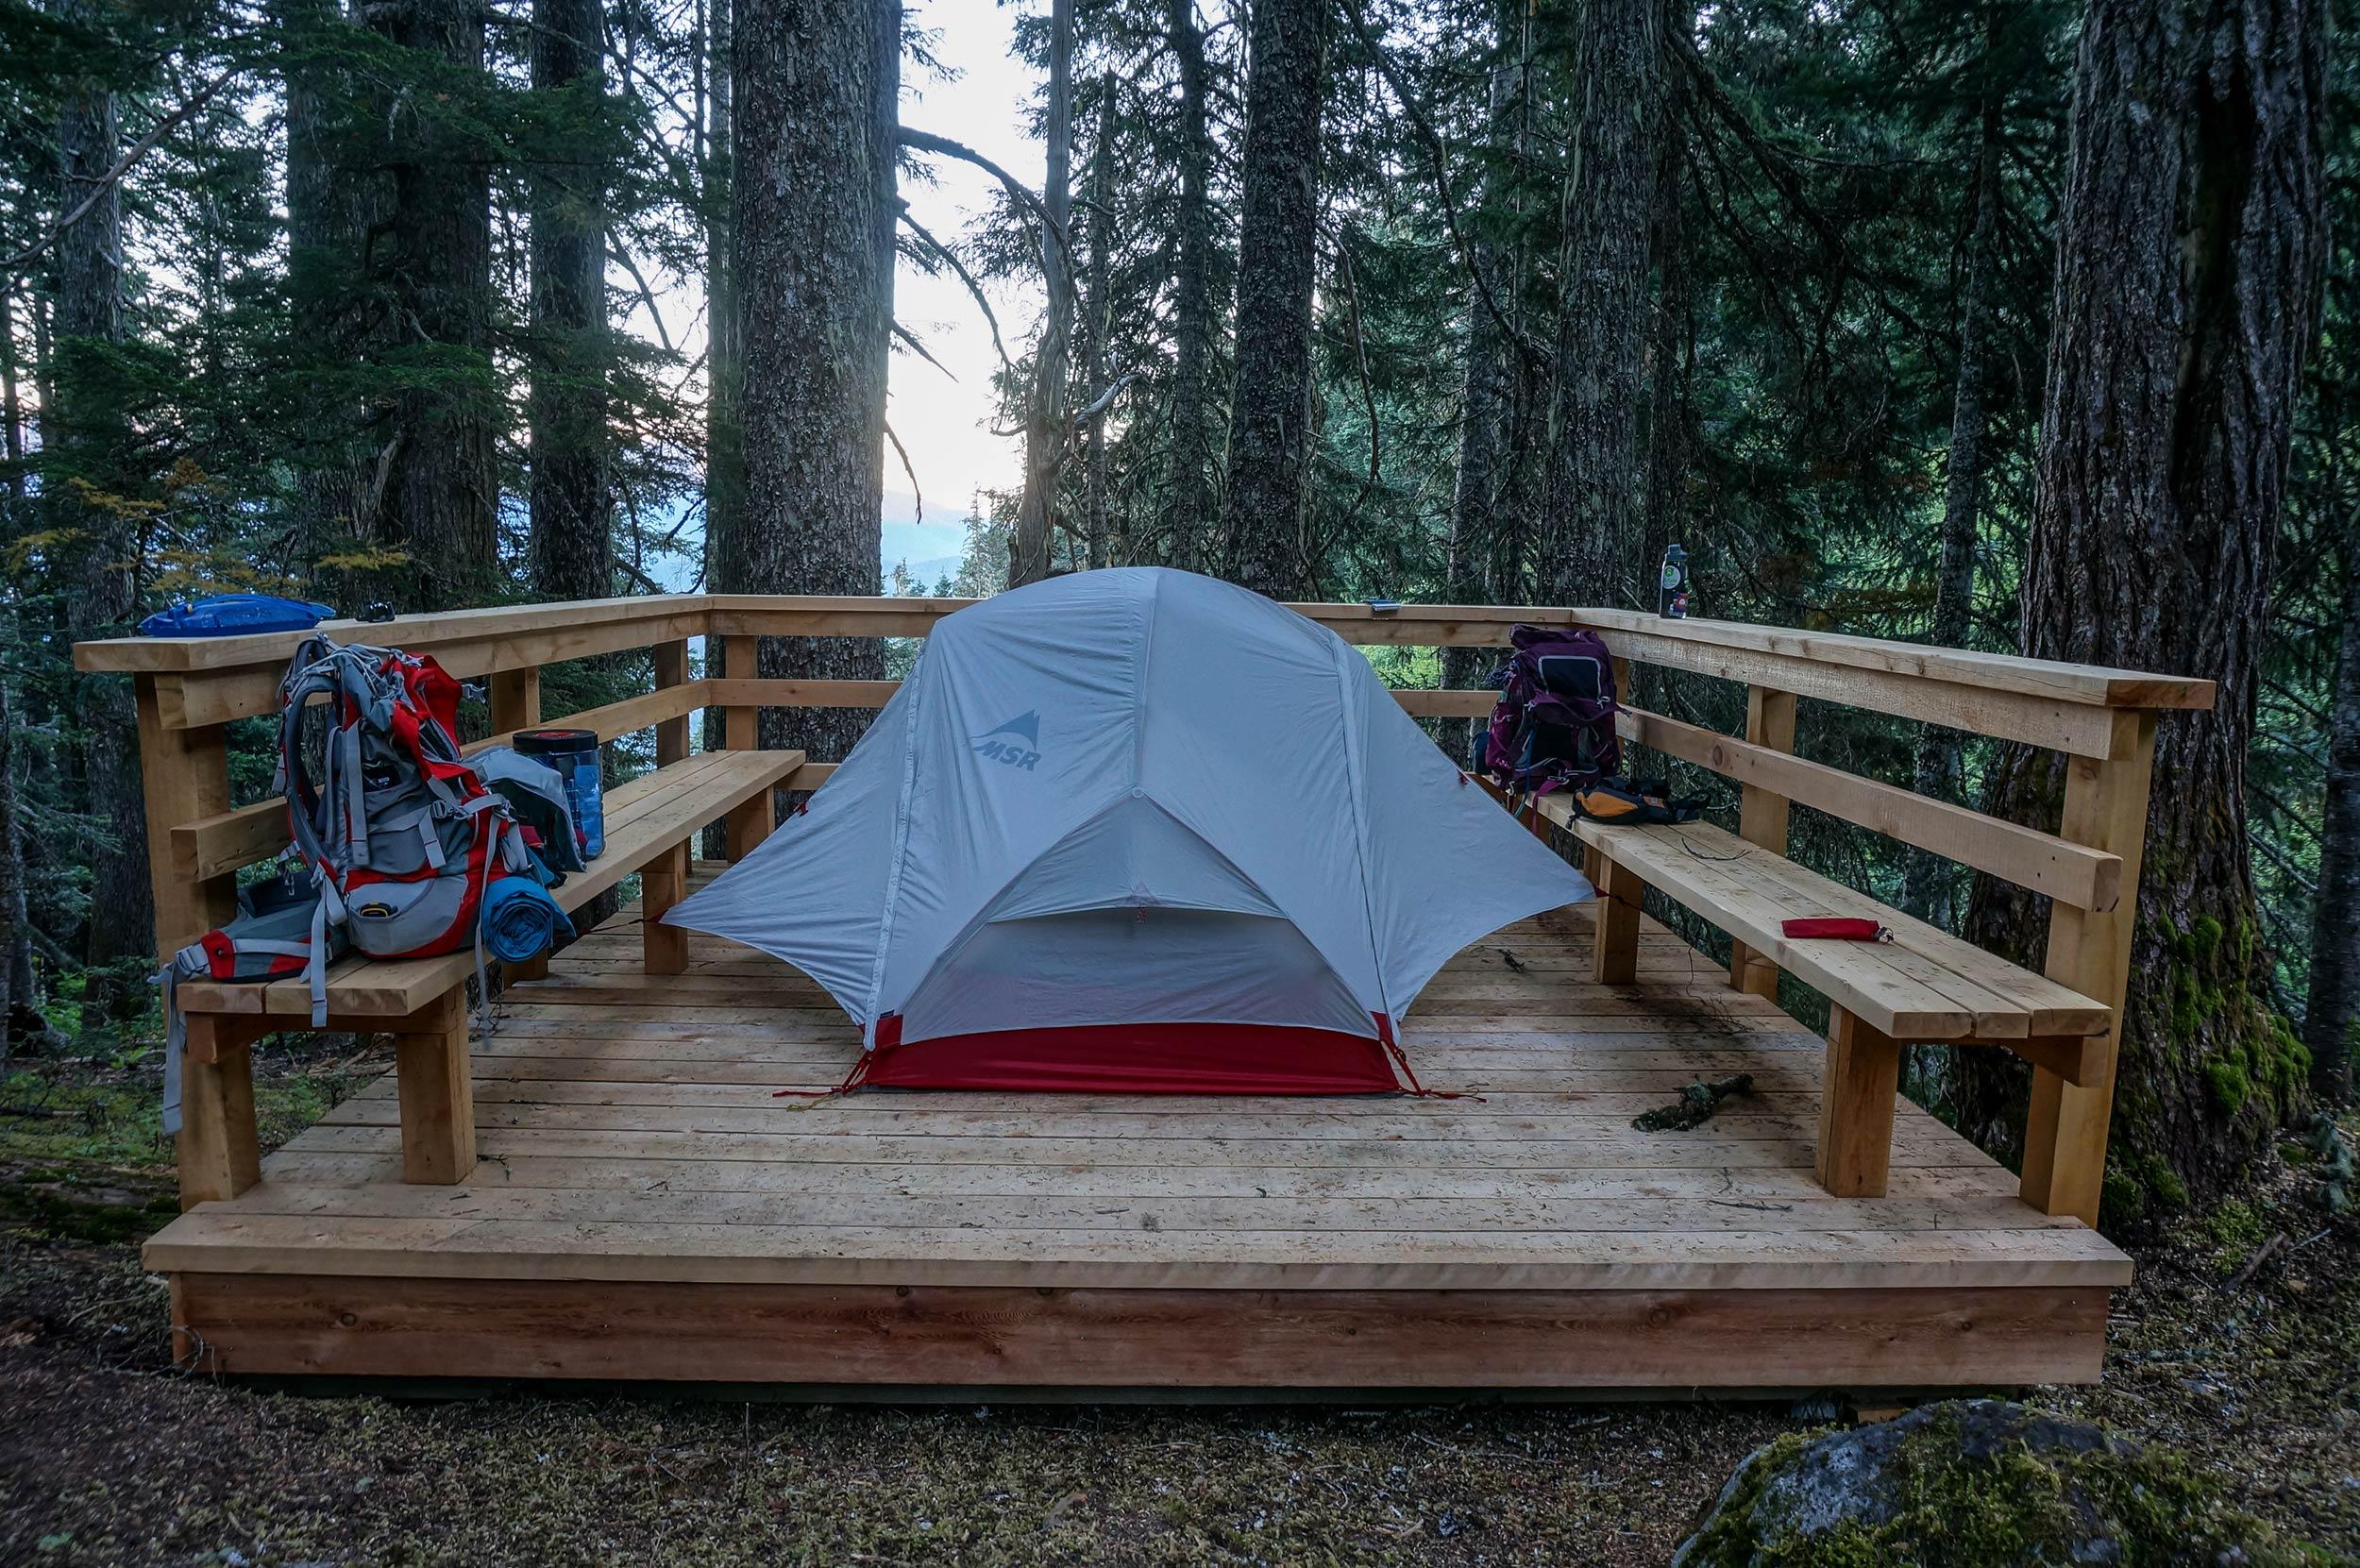 sproatt_alpine_trail_tent_platform_msr.jpg